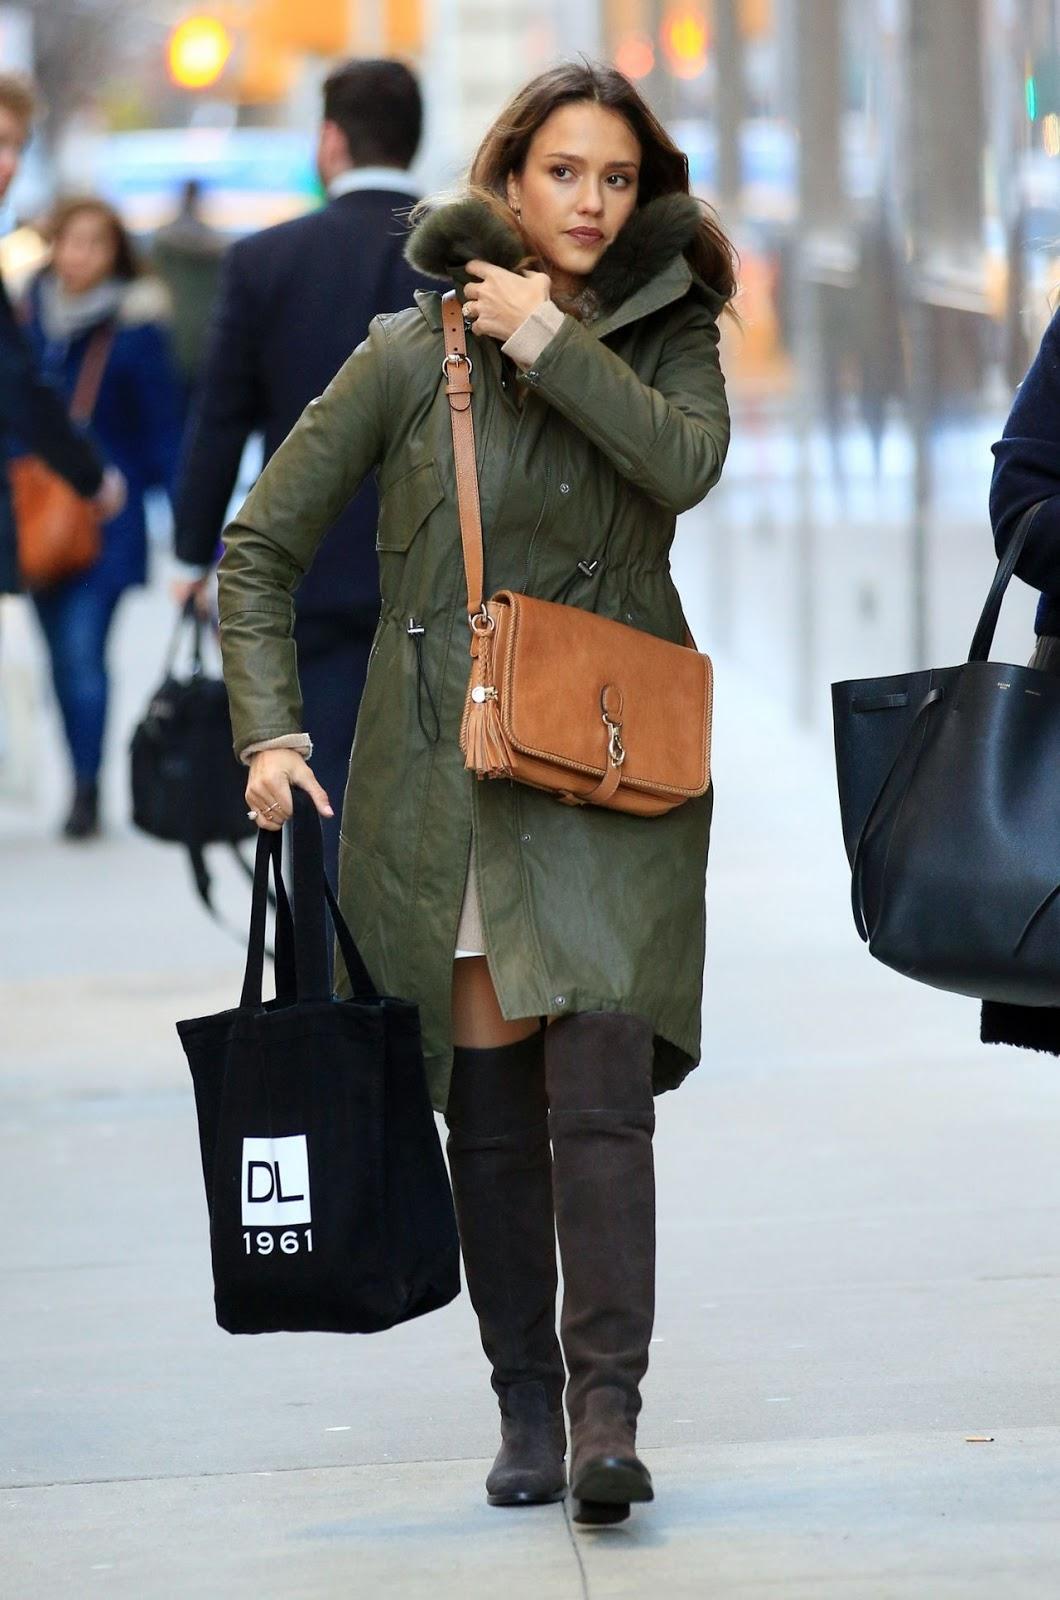 Jessicaalba Winter Style Shopping In Nyc Venucit